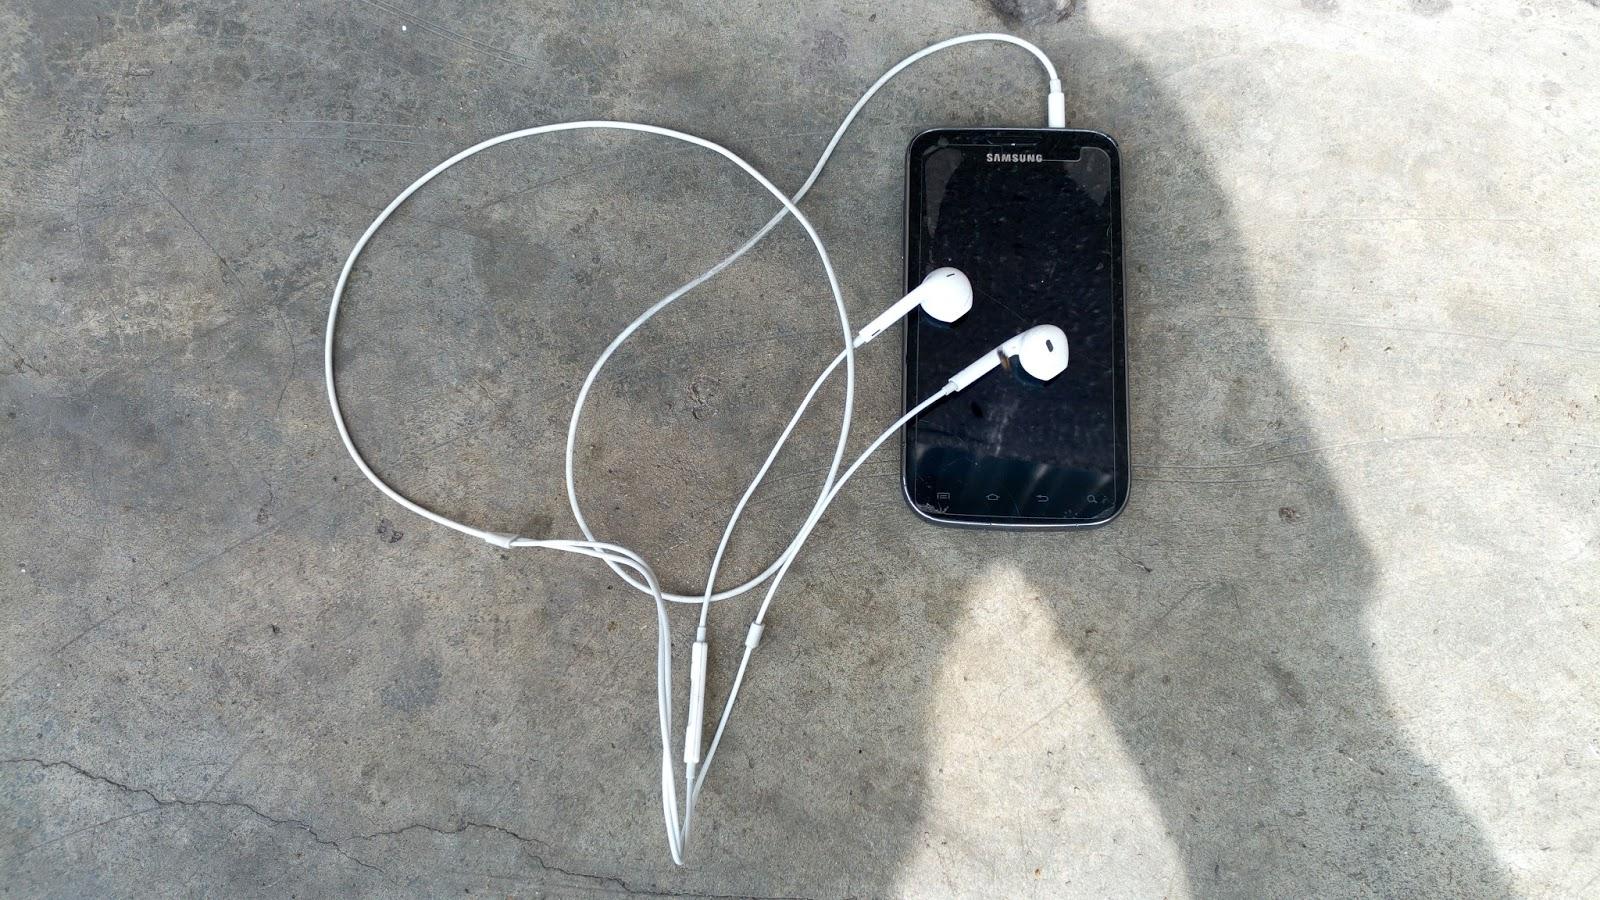 Image showing apple earphones